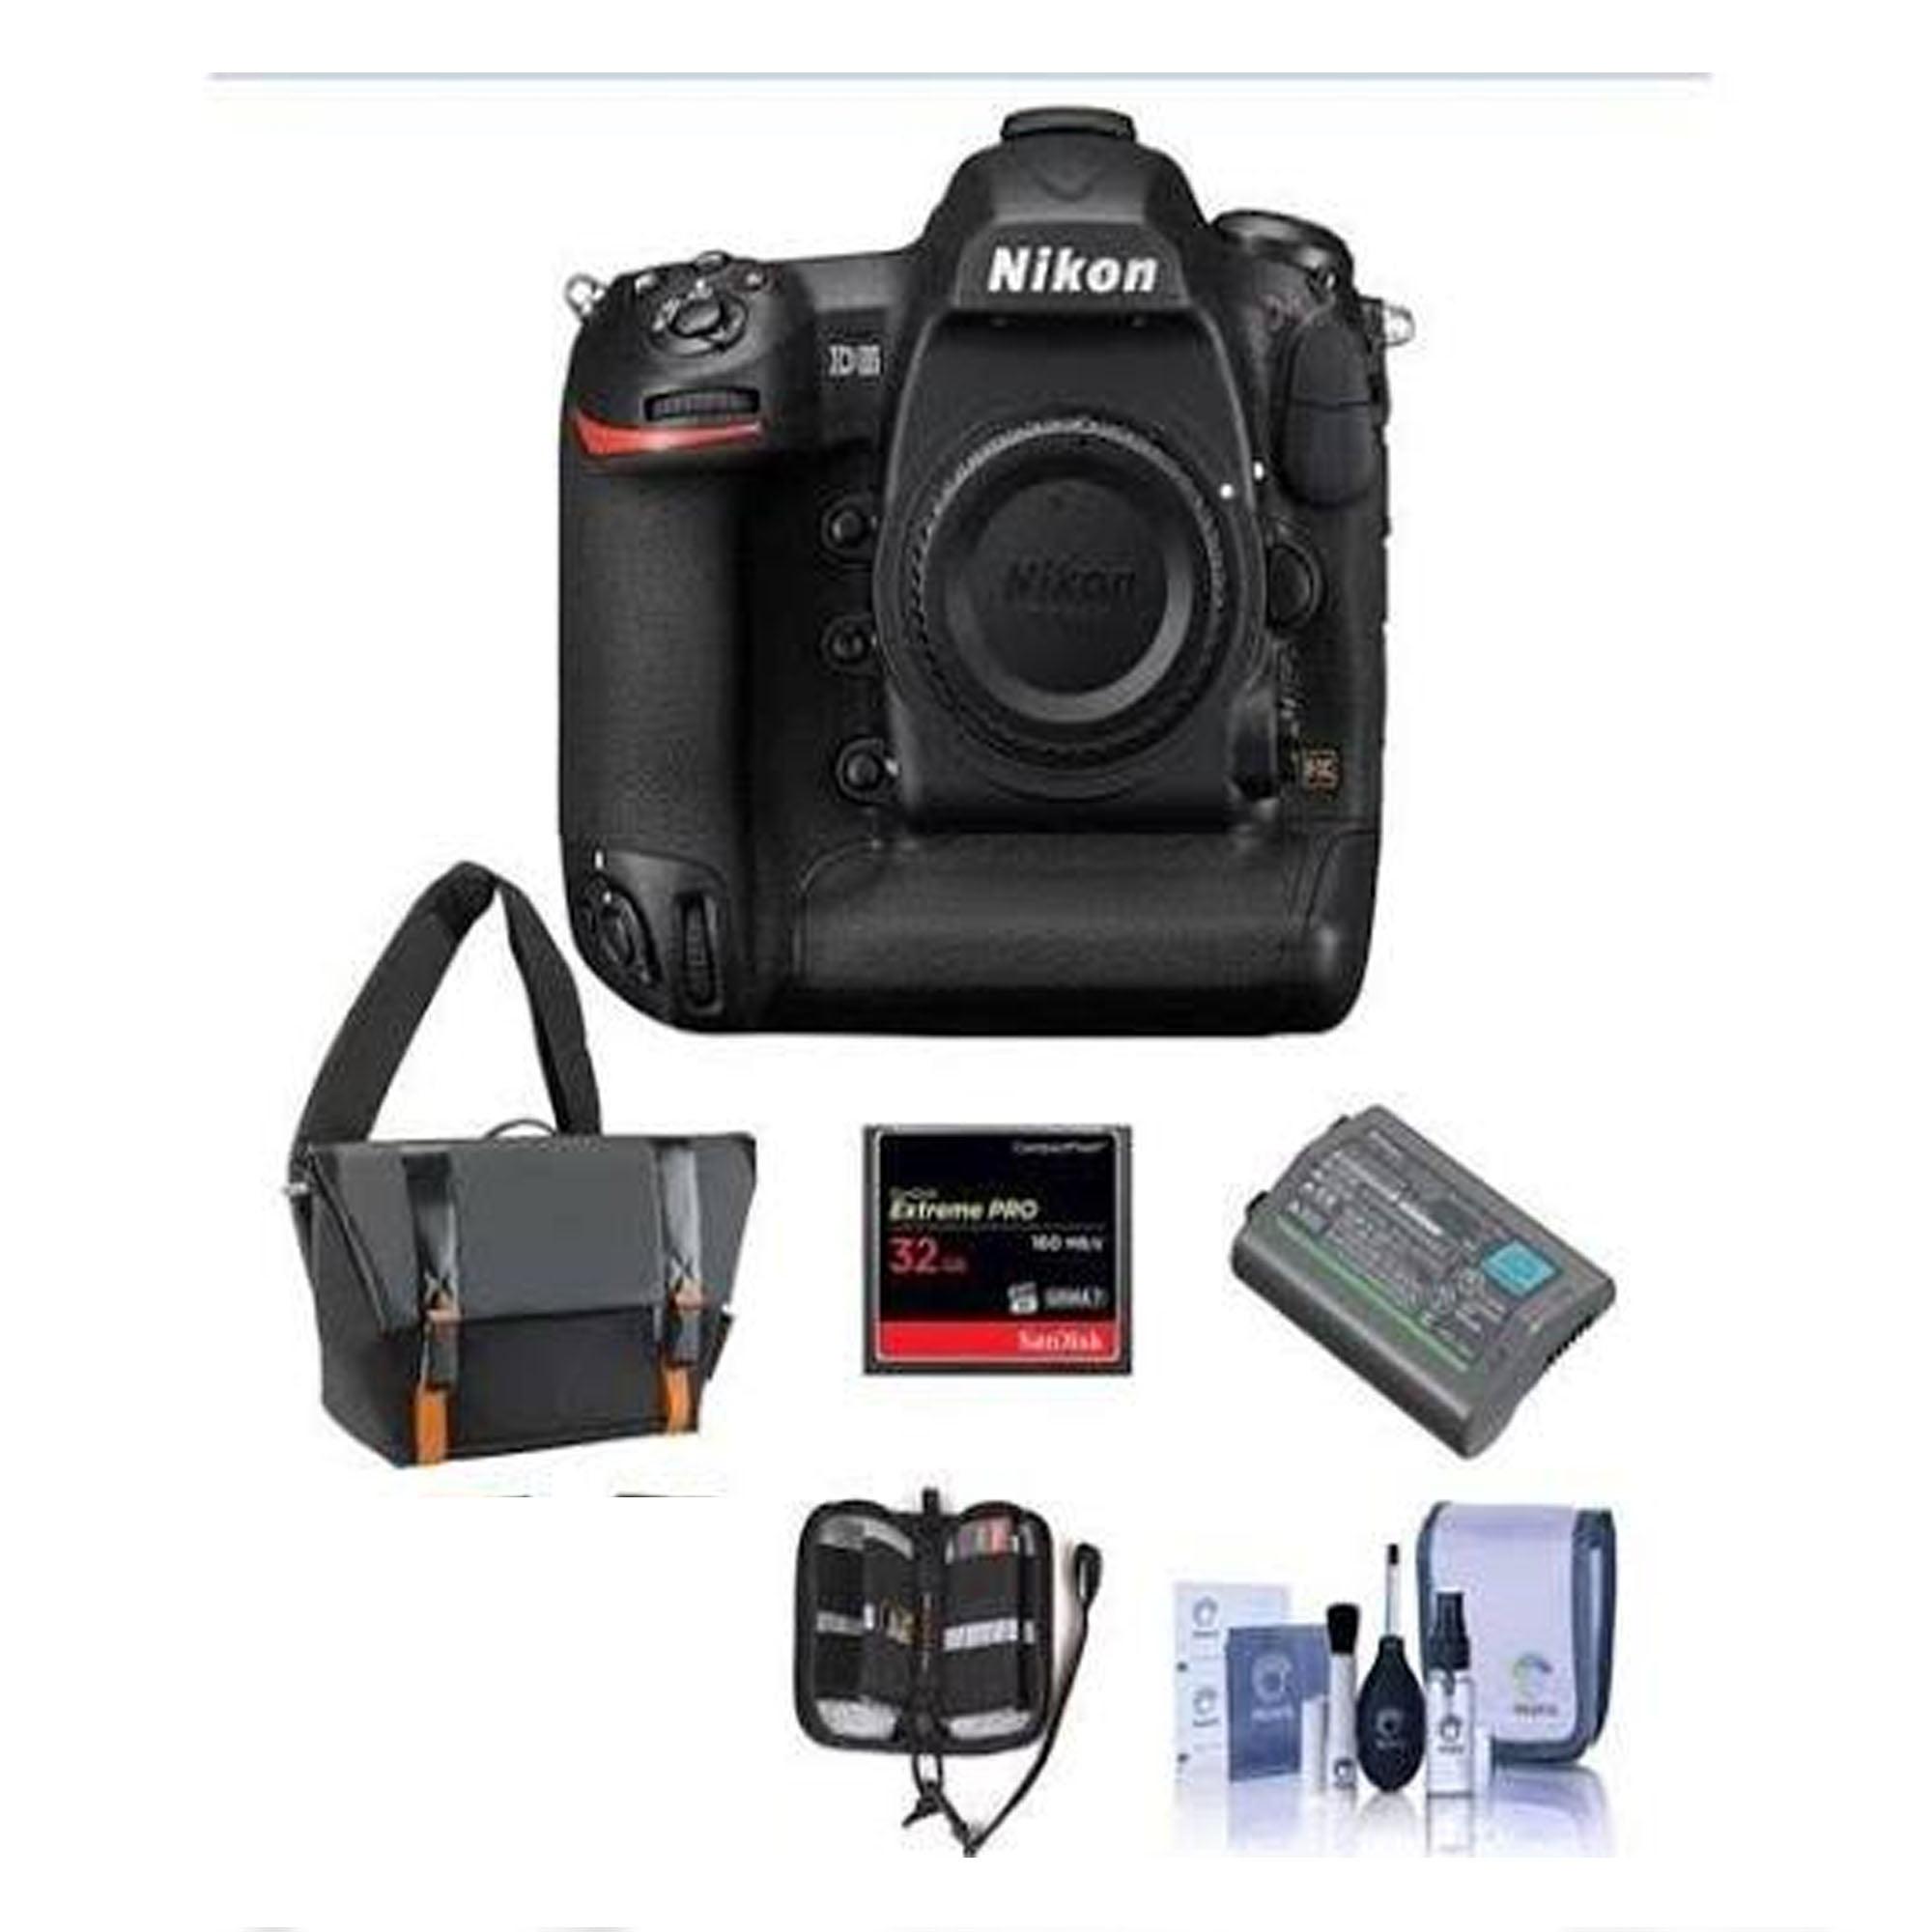 Nikon D5 FX-Format Digital SLR Camera Body (Cf Version) - Bundle with Camera Bag, Spare EN-EL18a Bat - image 1 de 1